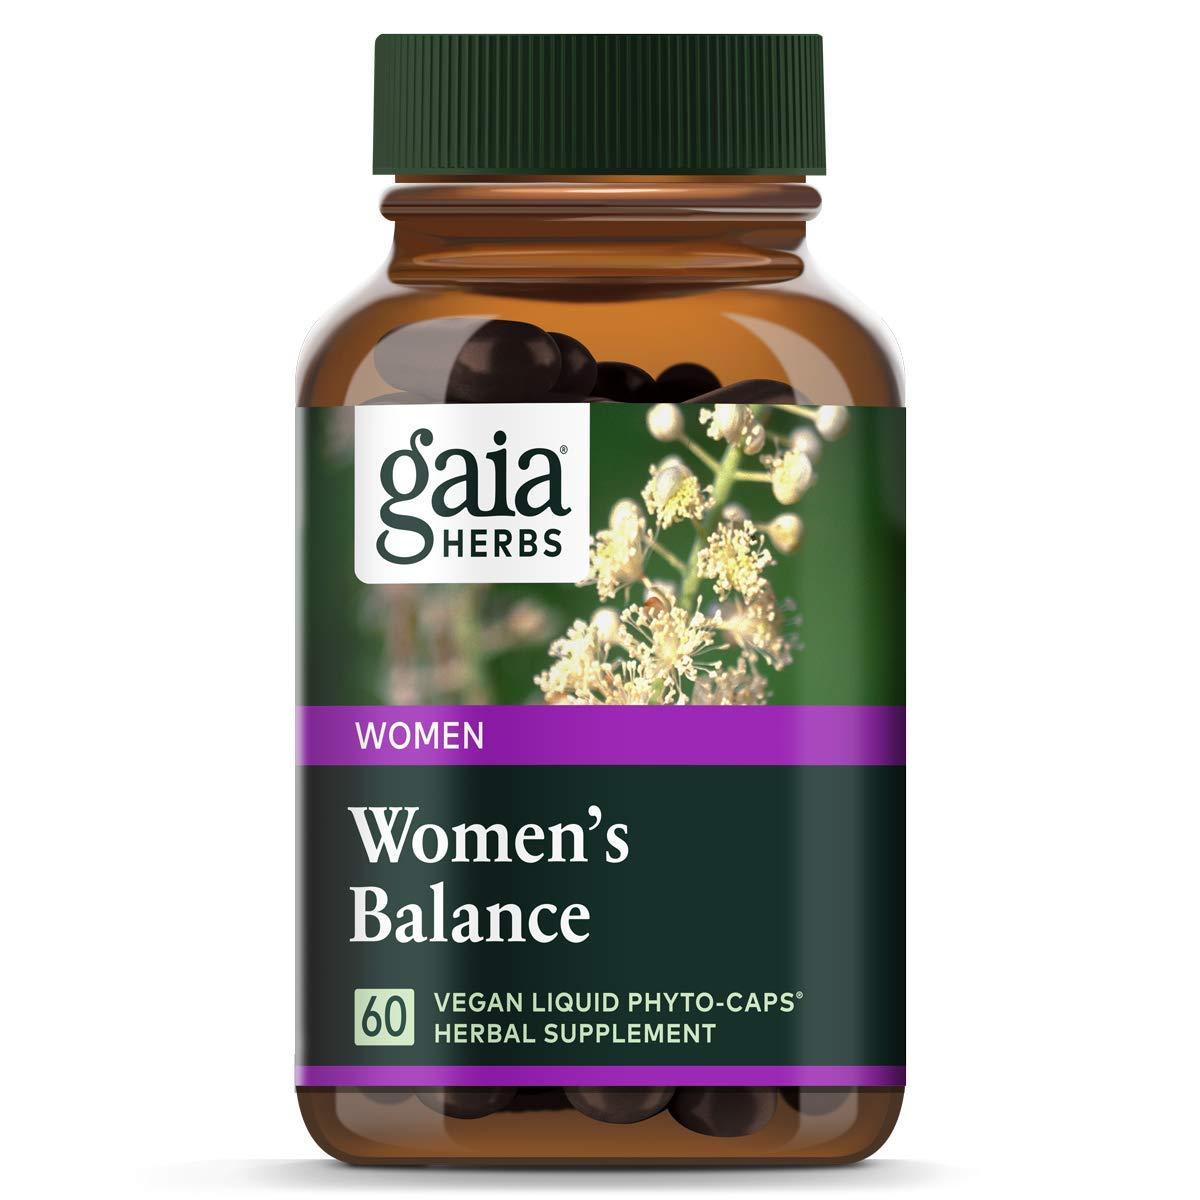 Gaia Herbs Women's Balance, Vegan Liquid Capsules, 60 Count - Hormone Balance for Women, Mood and Liver Support, Black Cohosh, St John's Wort, Organic Red Clover & Dandelion Root